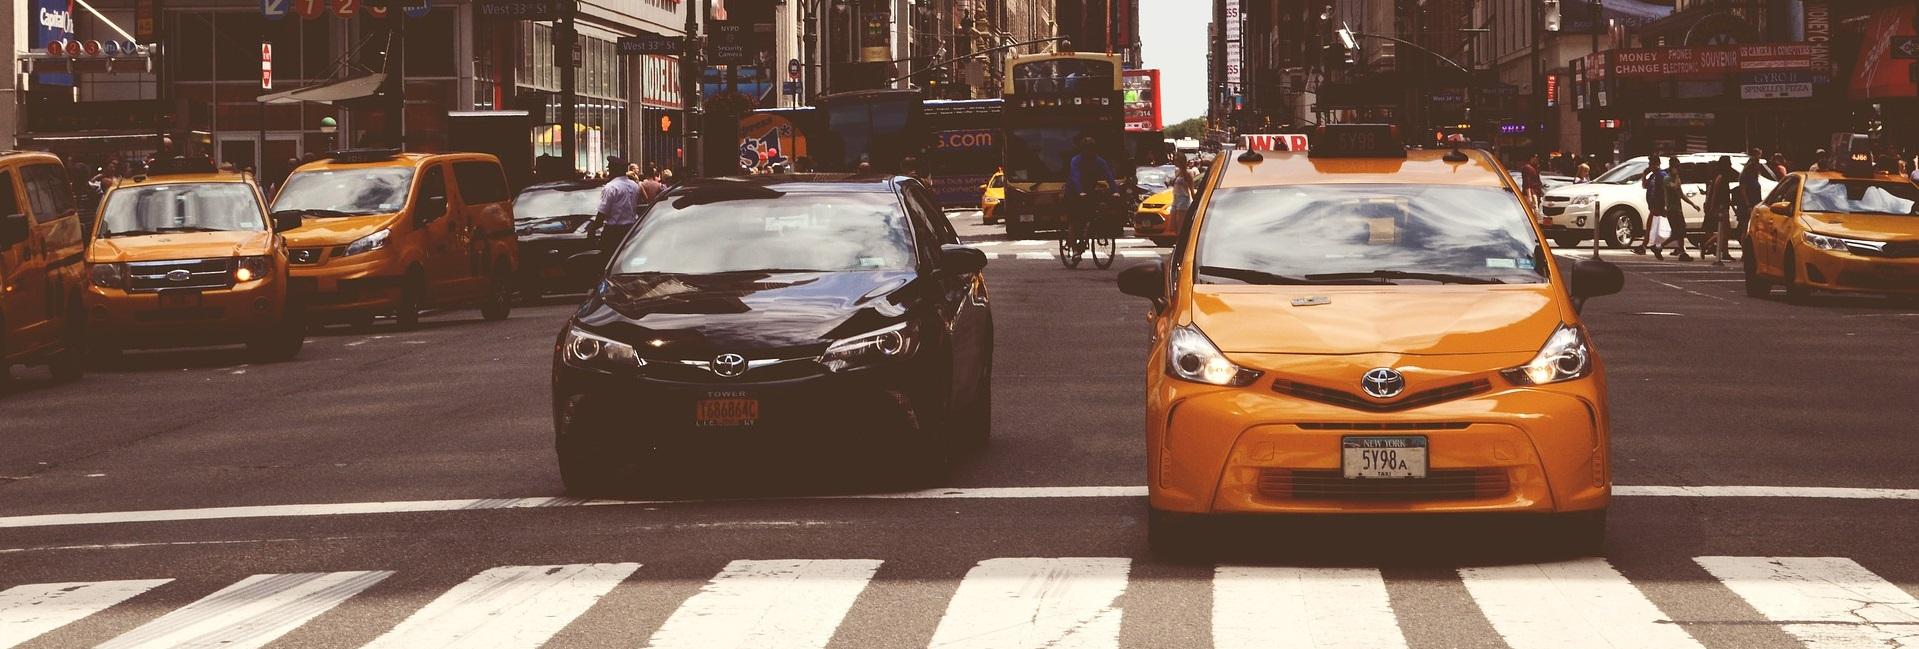 авто такси